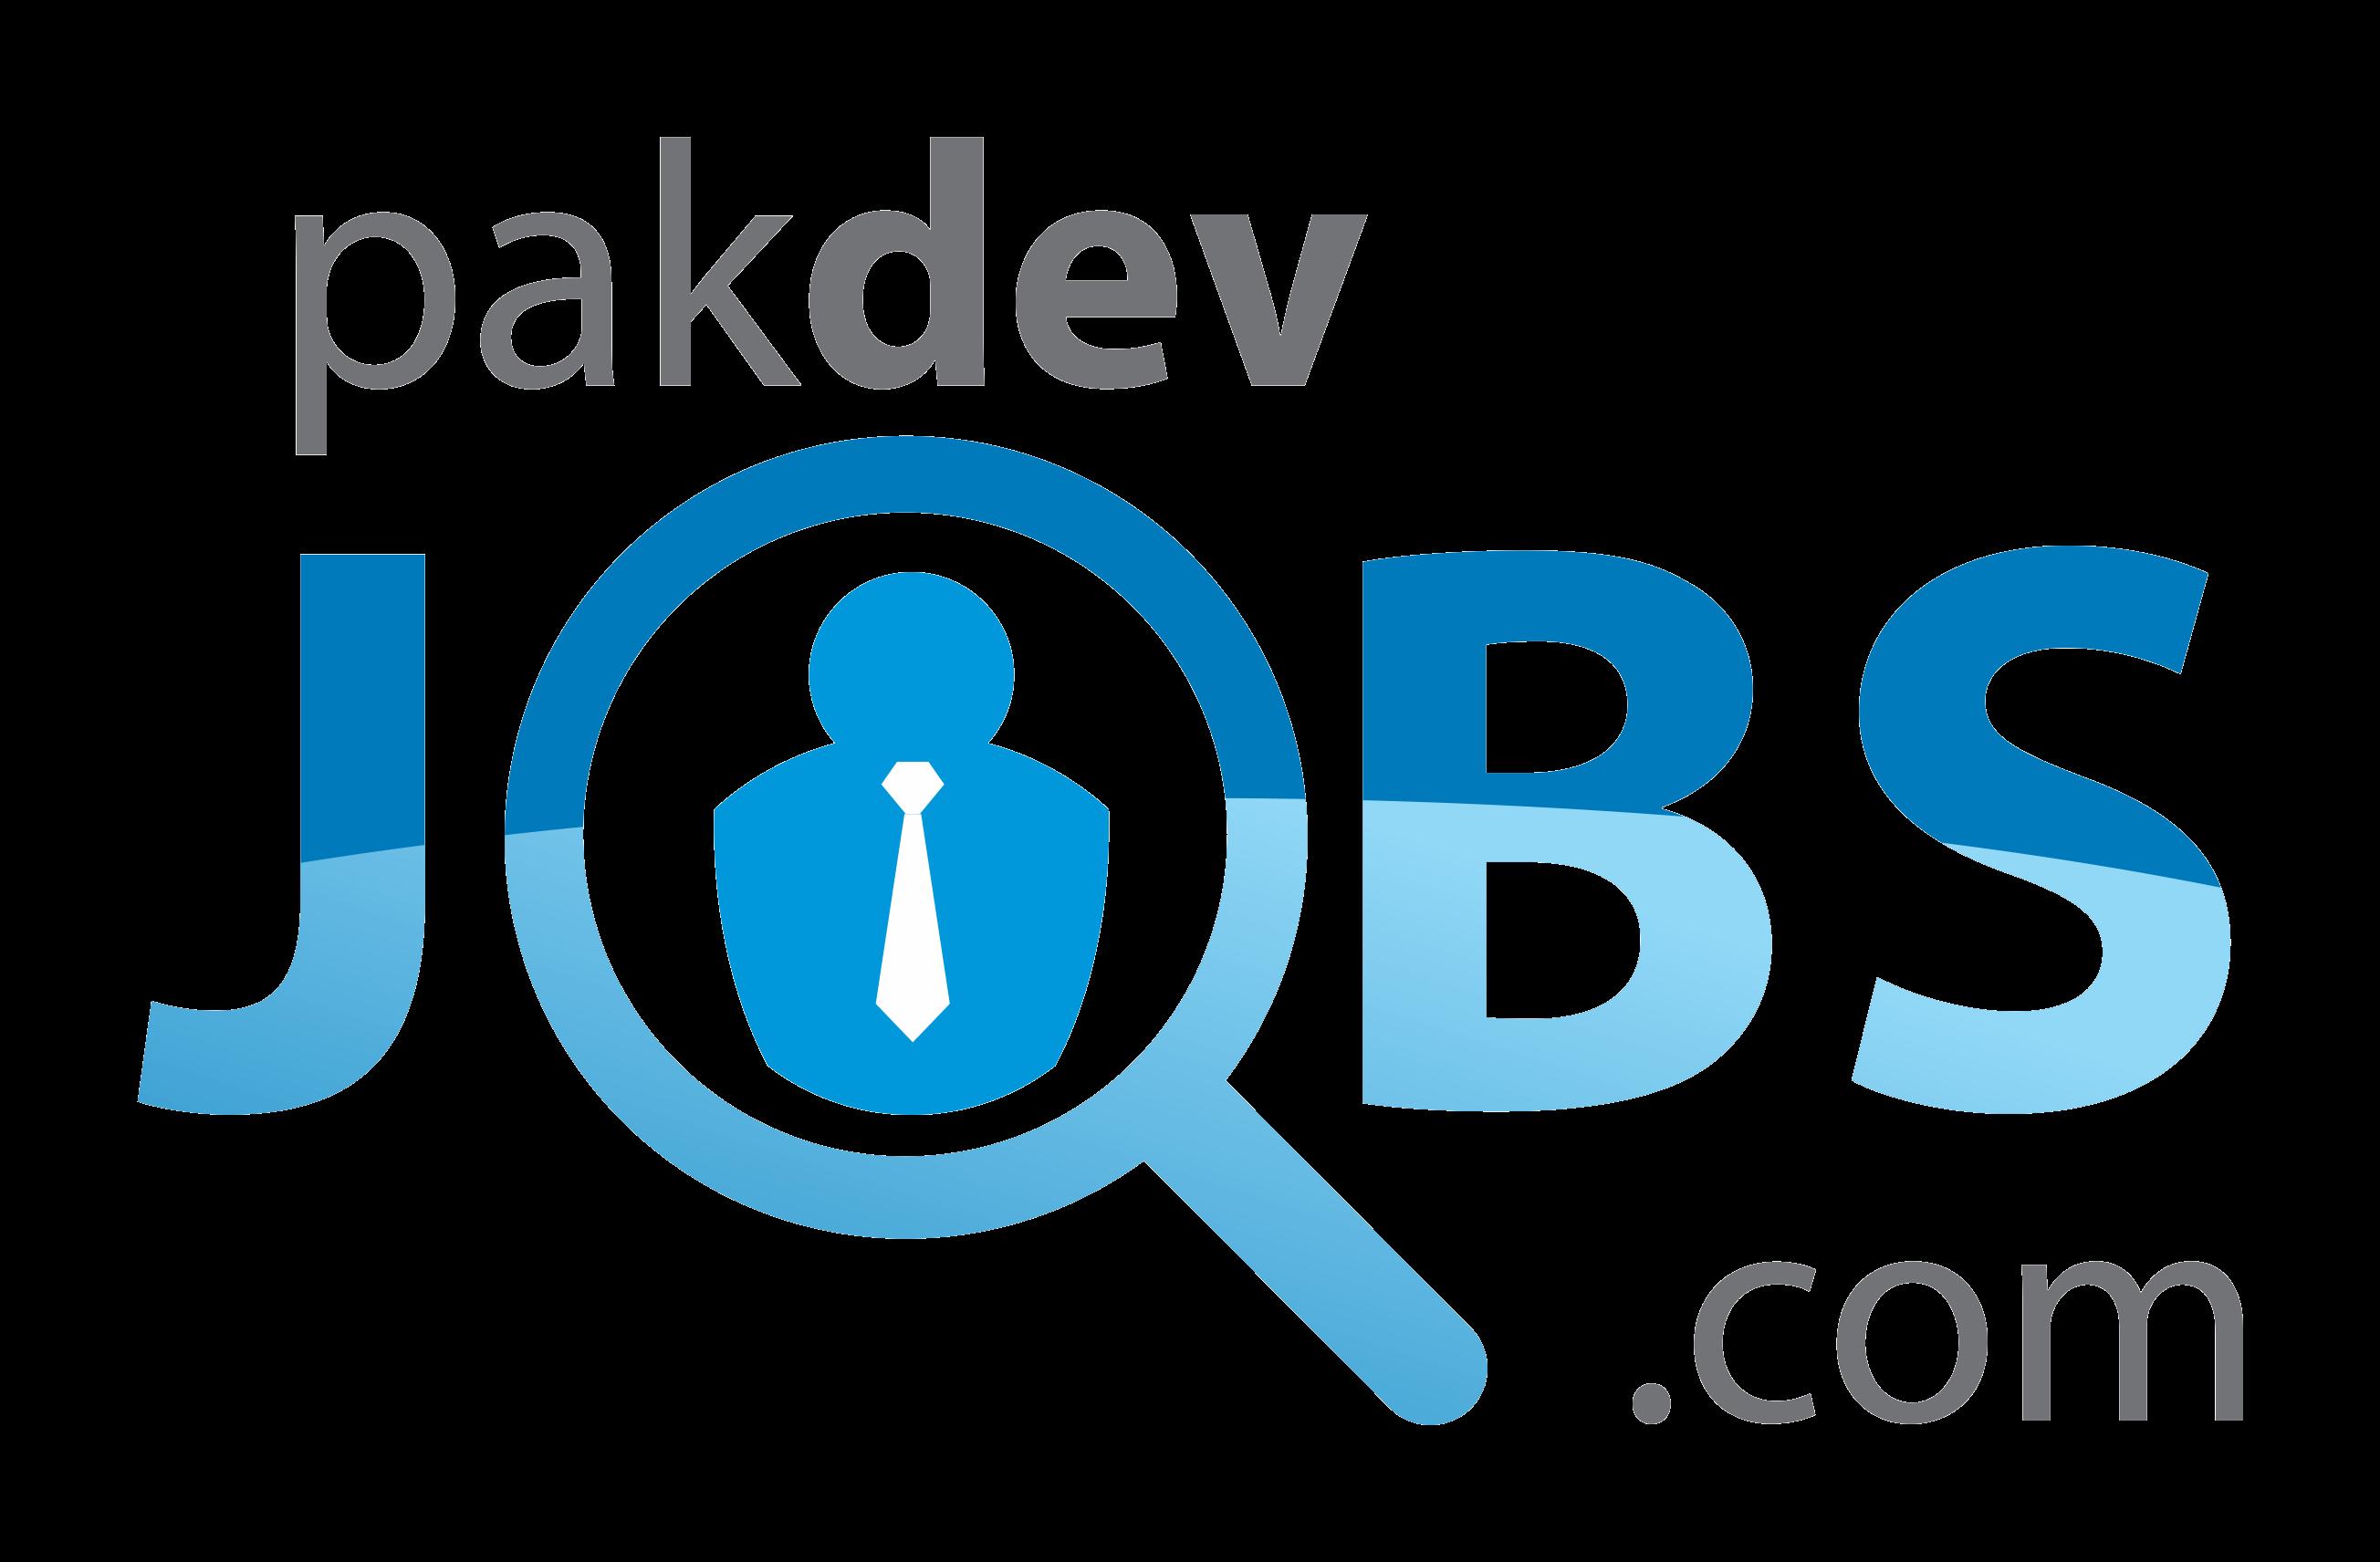 Job logo png 8 » PNG Image.